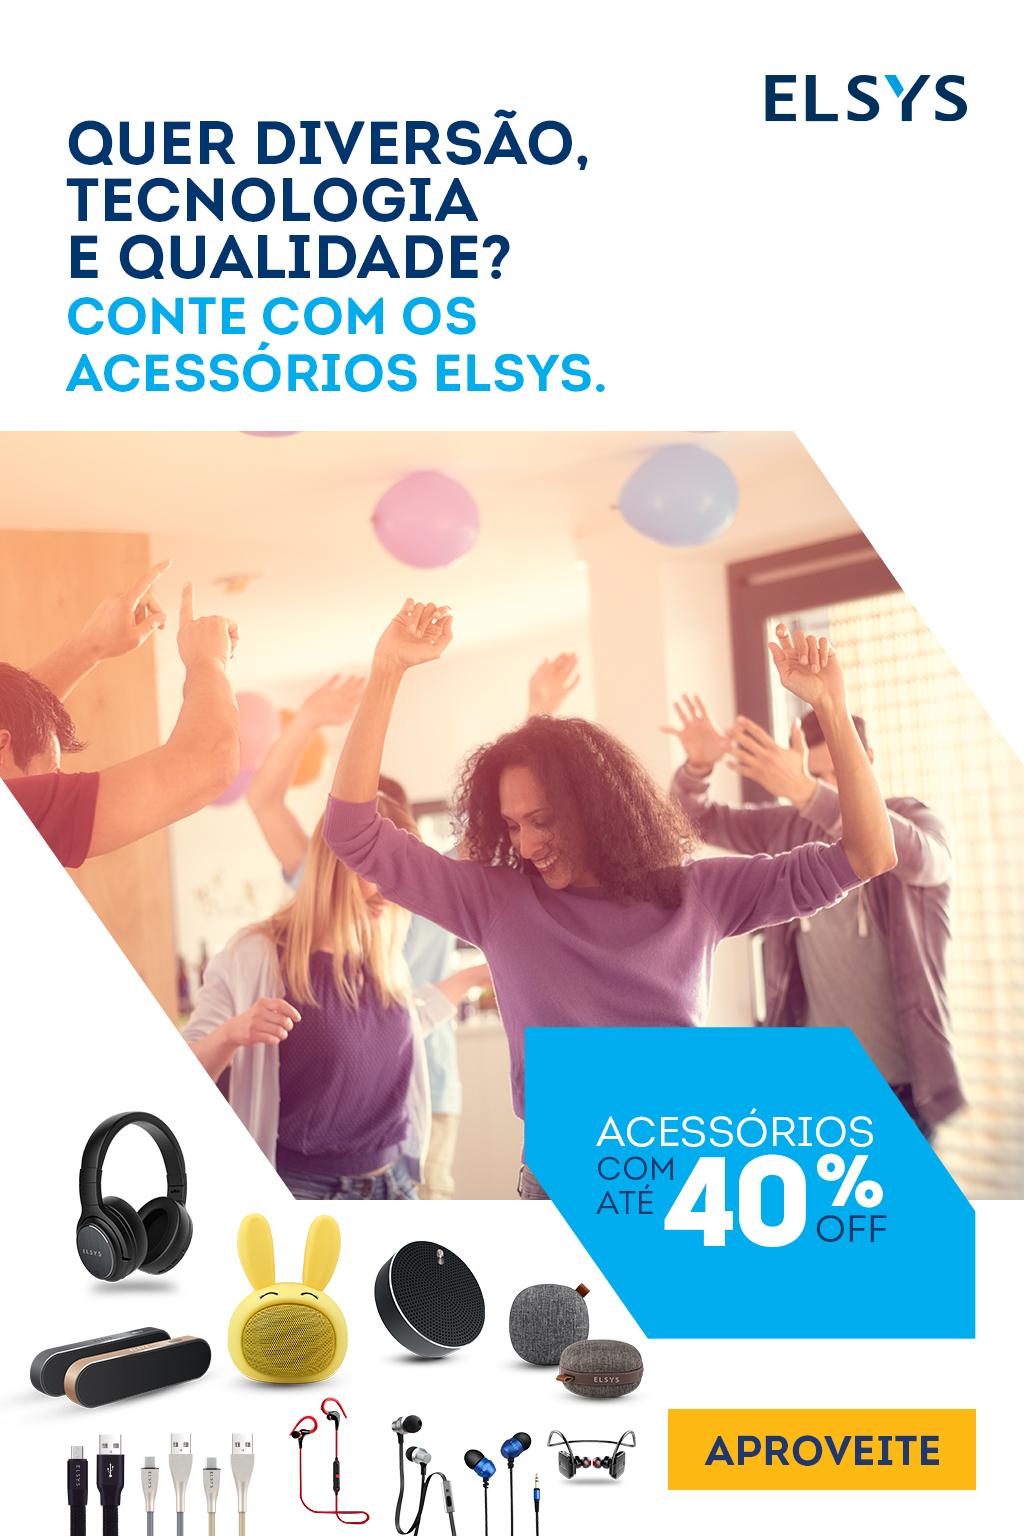 BANNER - ASCESSÓRIOS 40% OFF